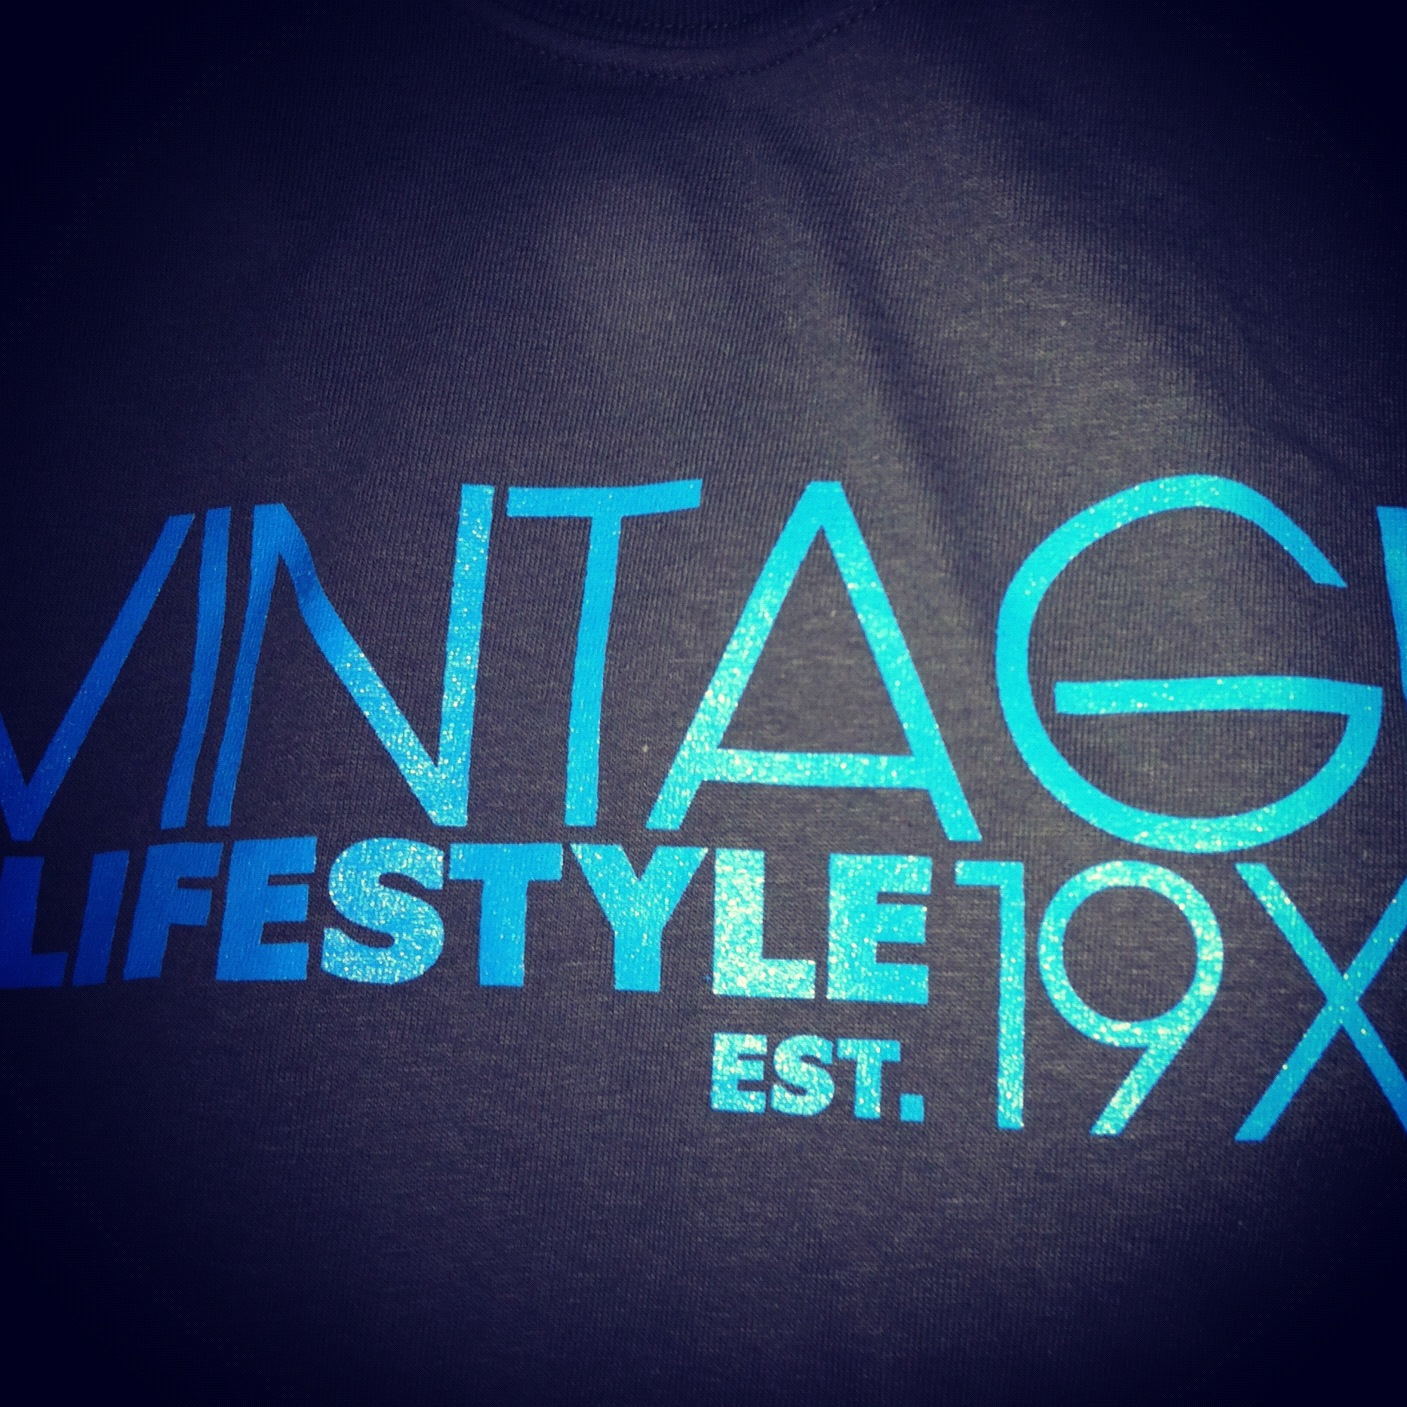 Vintage Lifestyle [Limited Edition] On Sale